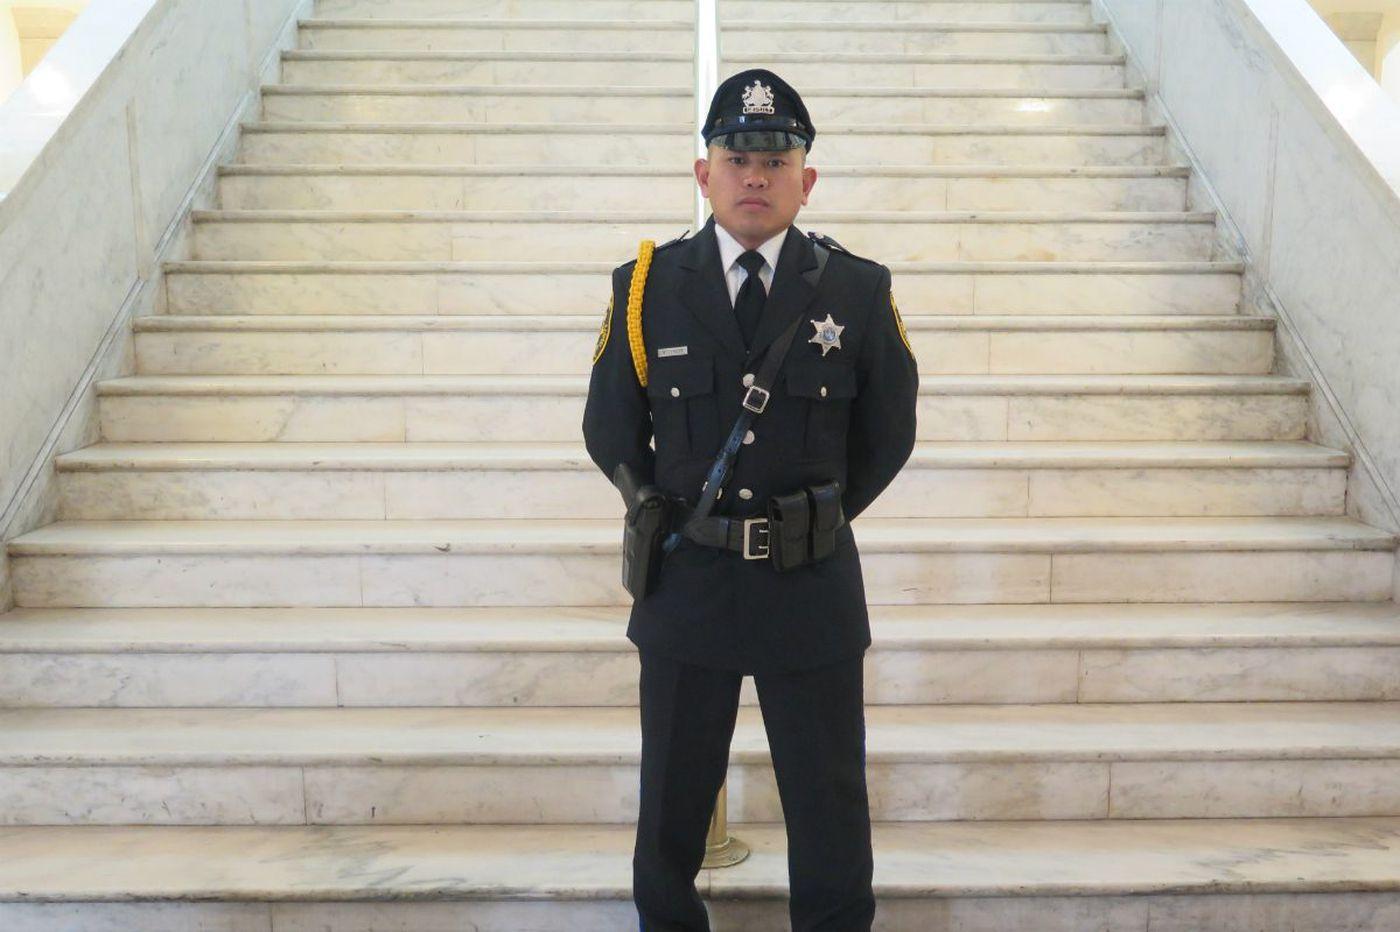 Sheriff's fund established to benefit deputy who lost 2 sons in Schwenksville fire